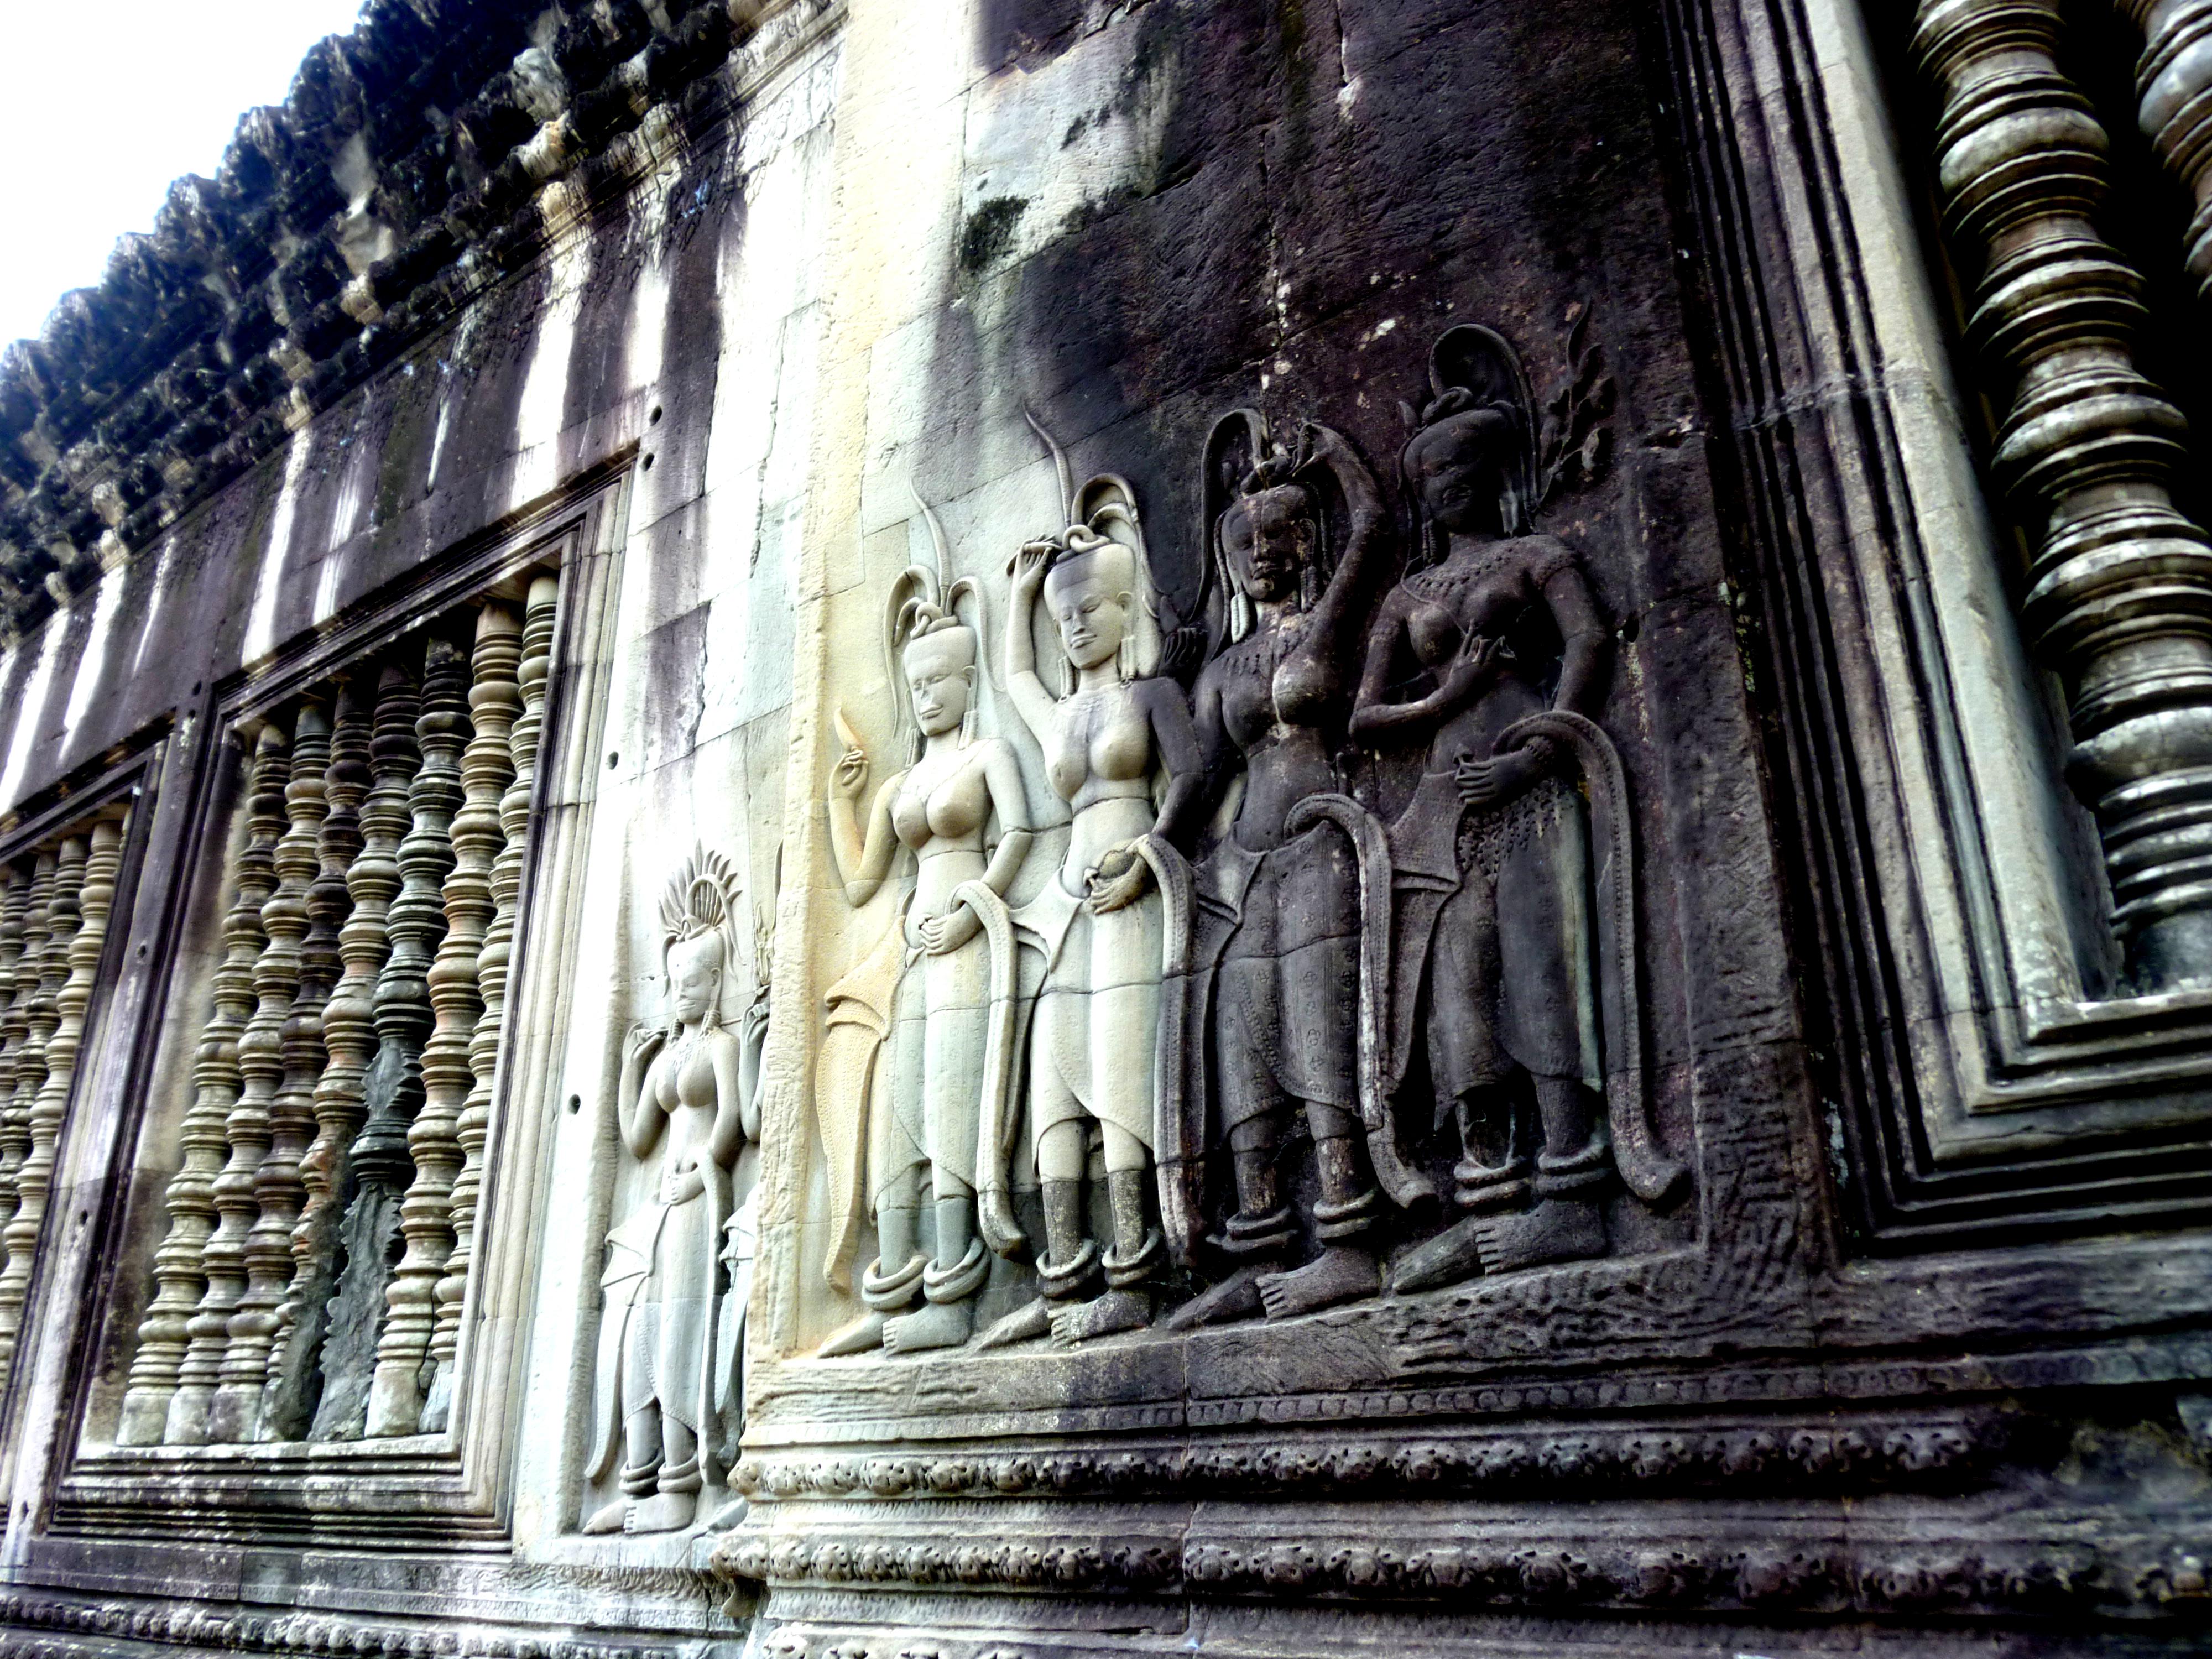 Angkor Wat temple Apsara figures